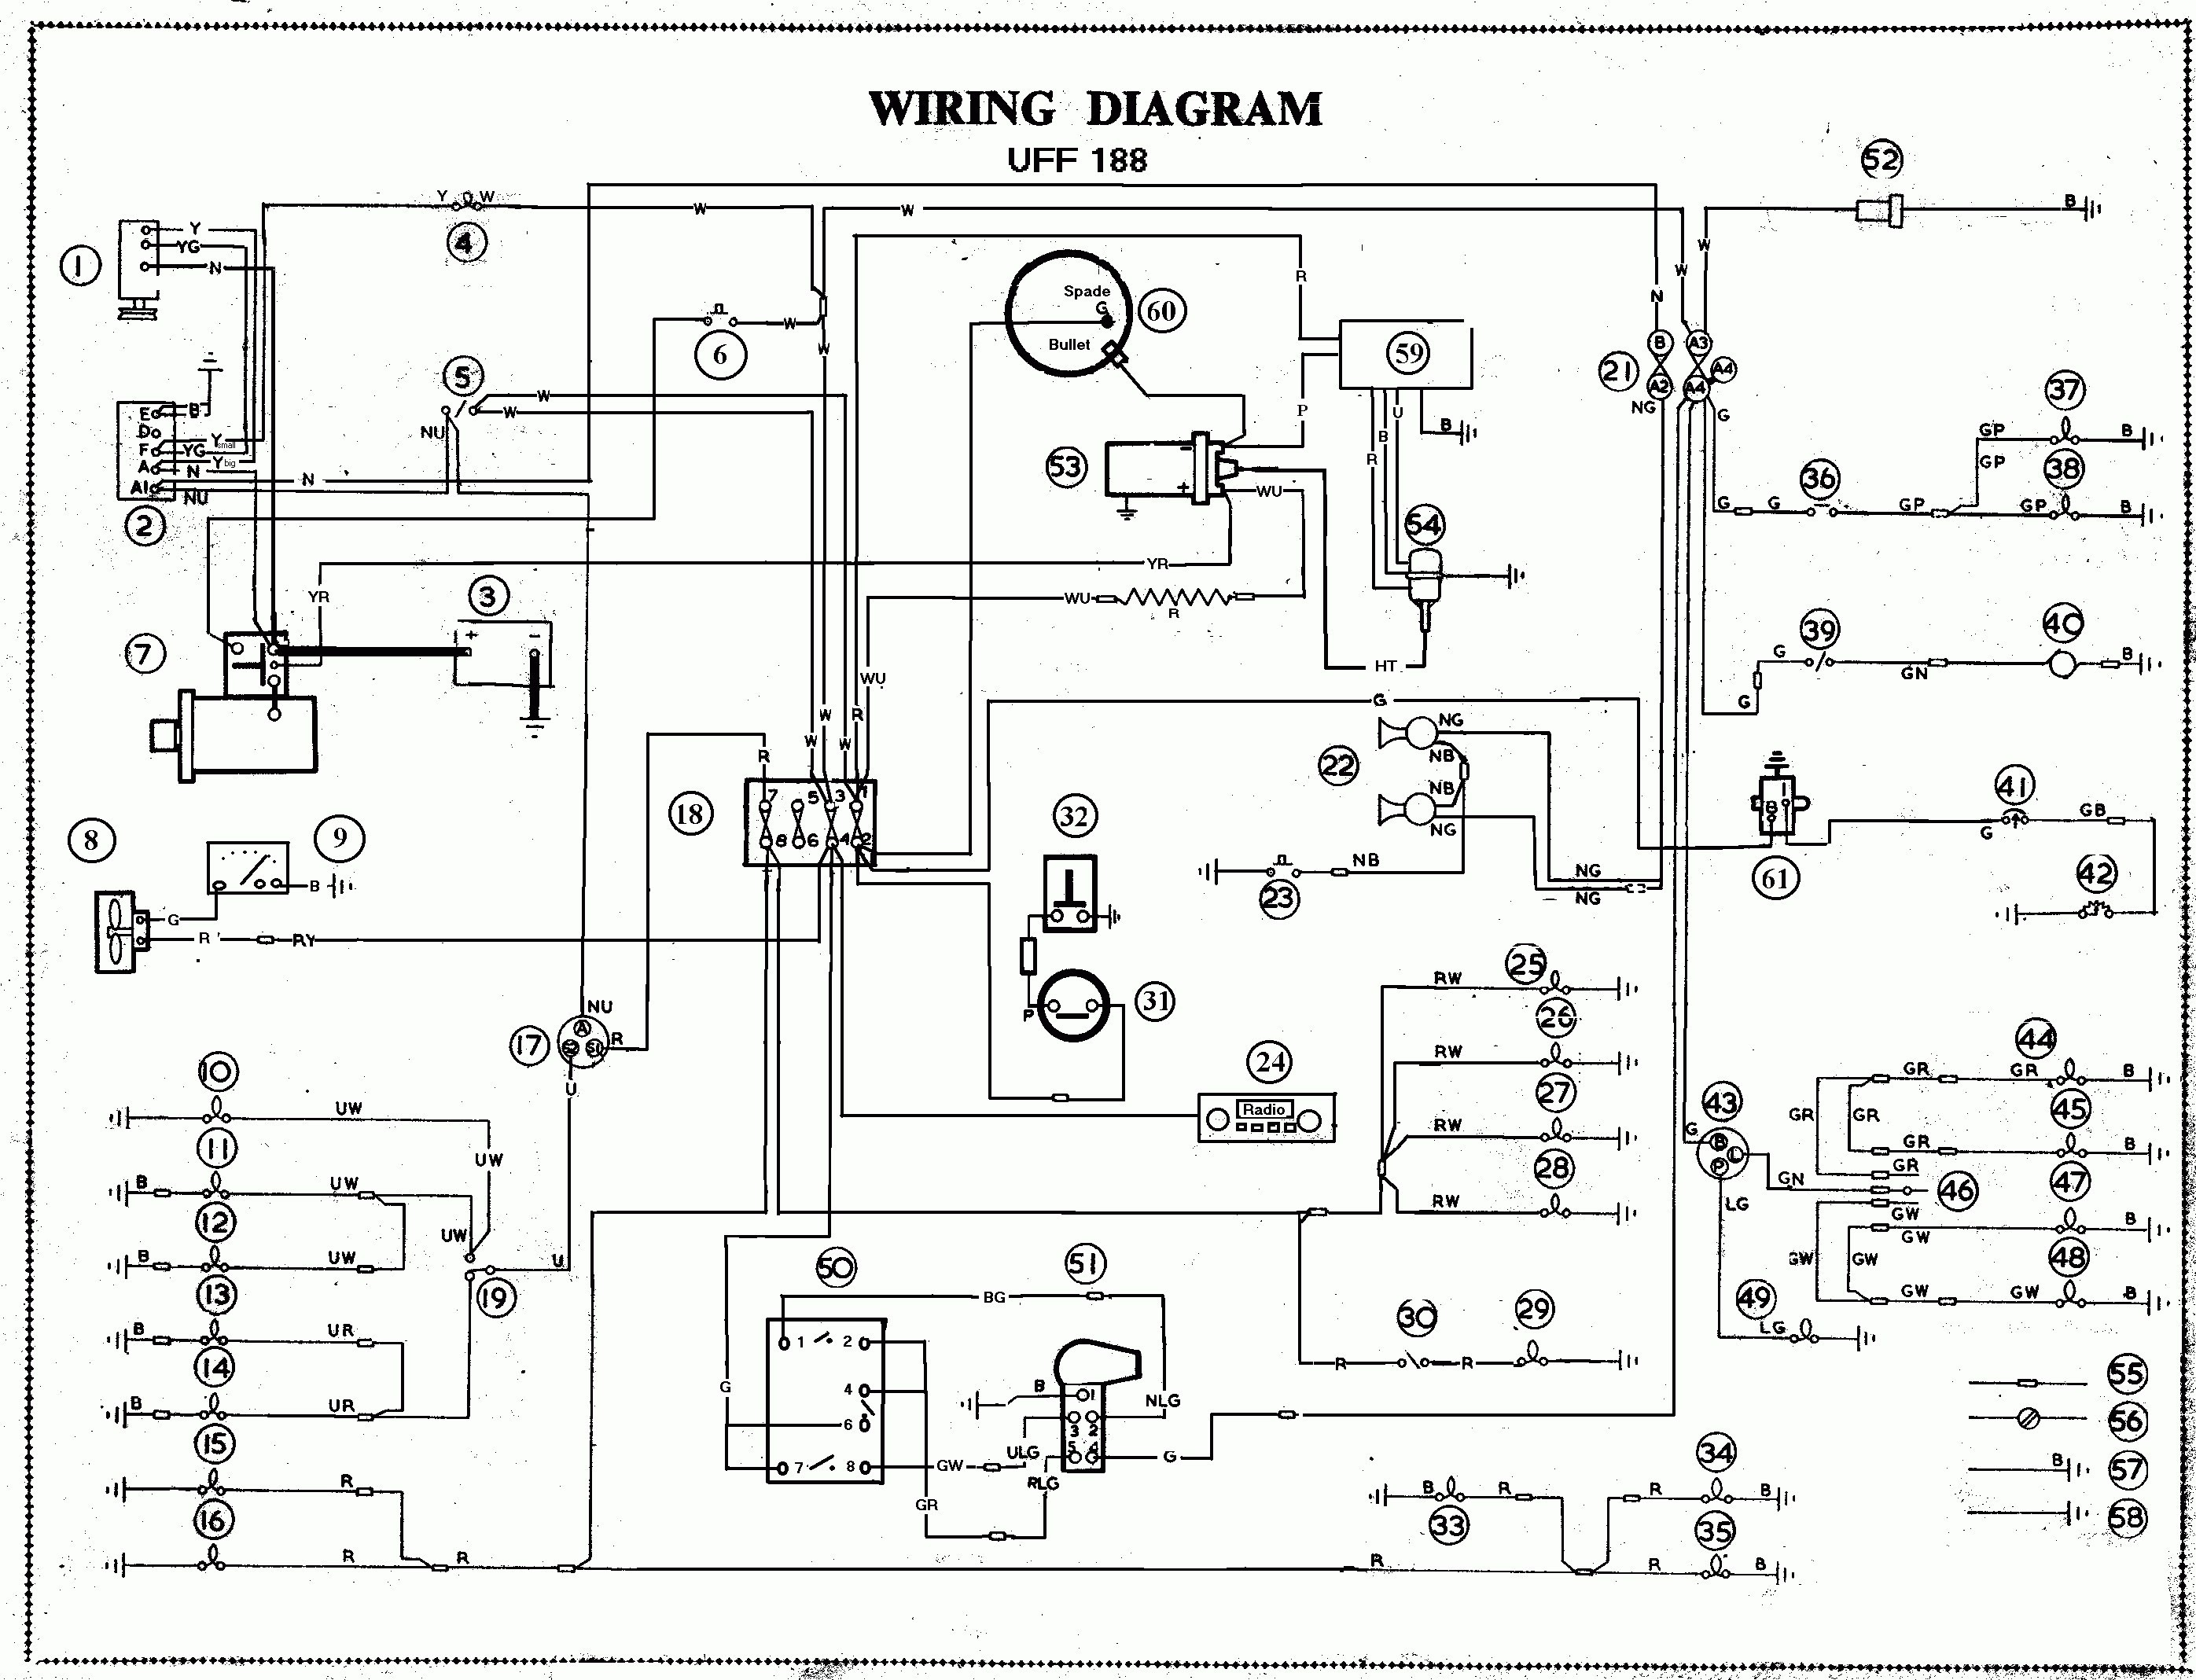 audi a2 wiring diagram stewart warner amp gauge 1997 a4 engine library symbols free download of